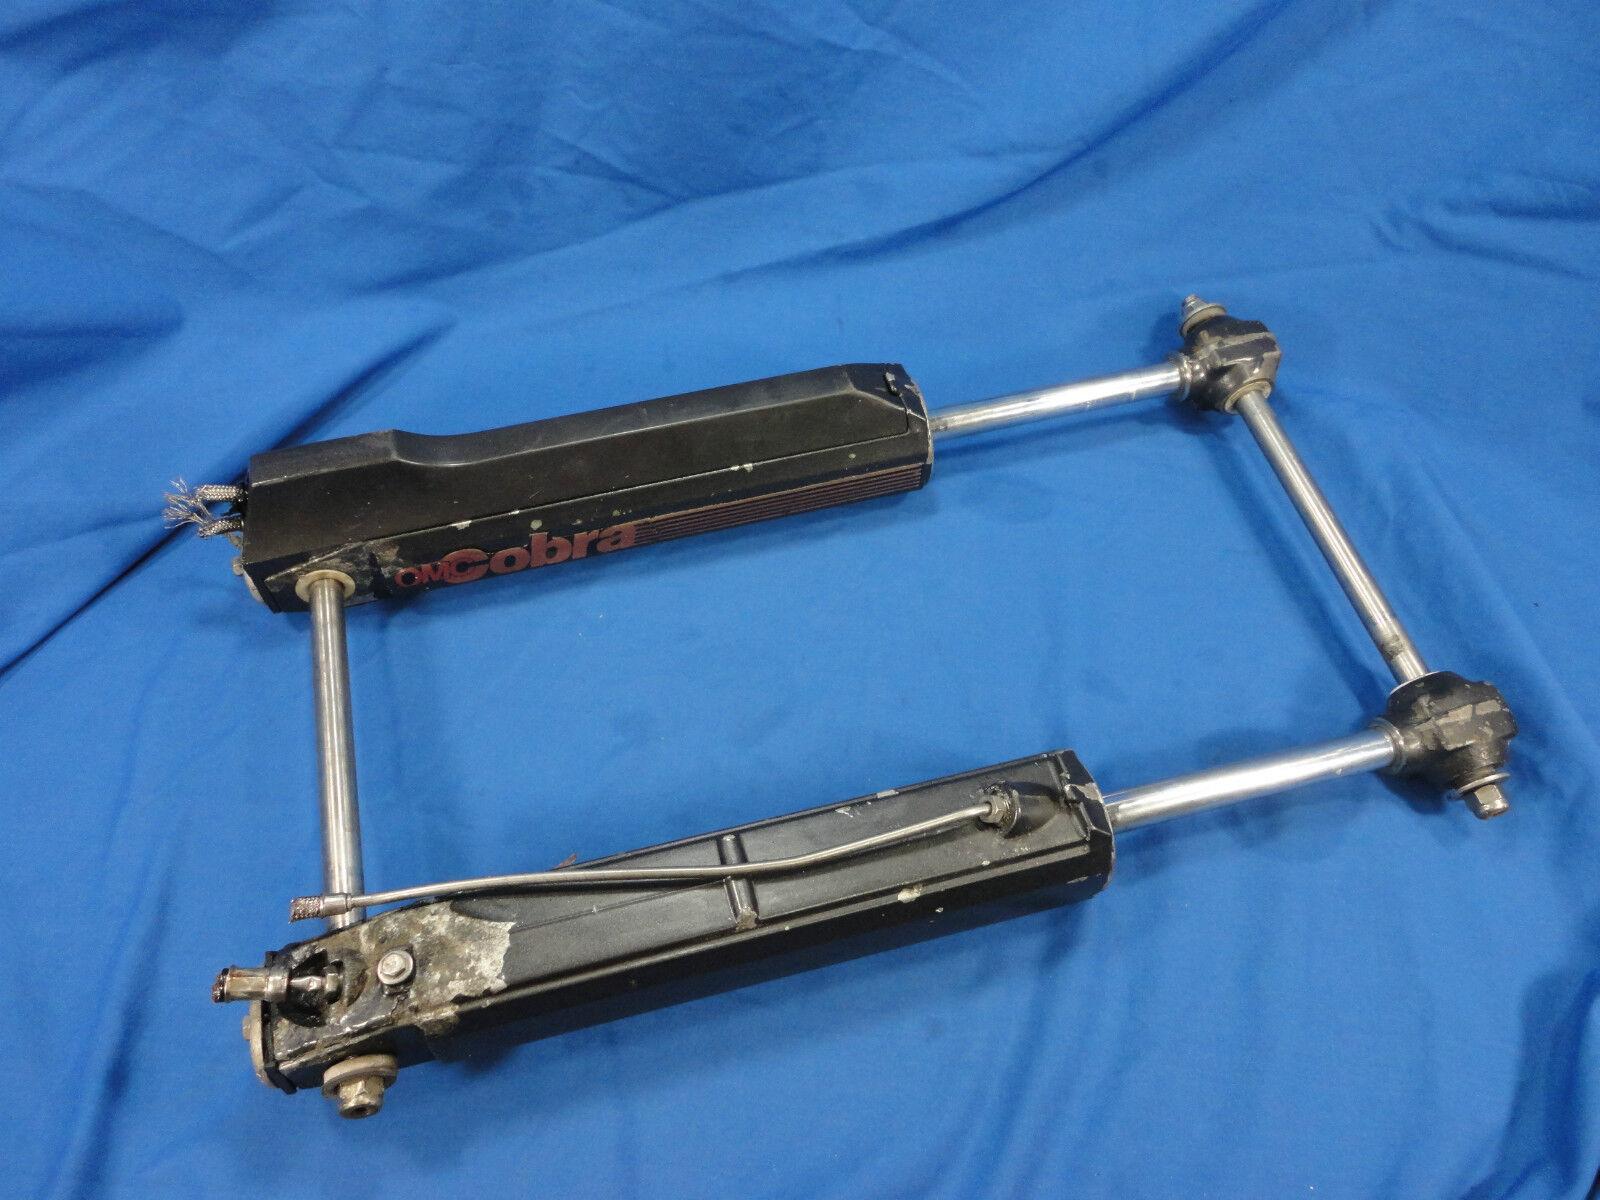 1984 - 1985 Omc Cobra 3.0 L Zylinder & Gabelkopf Assy Pn : 0983735